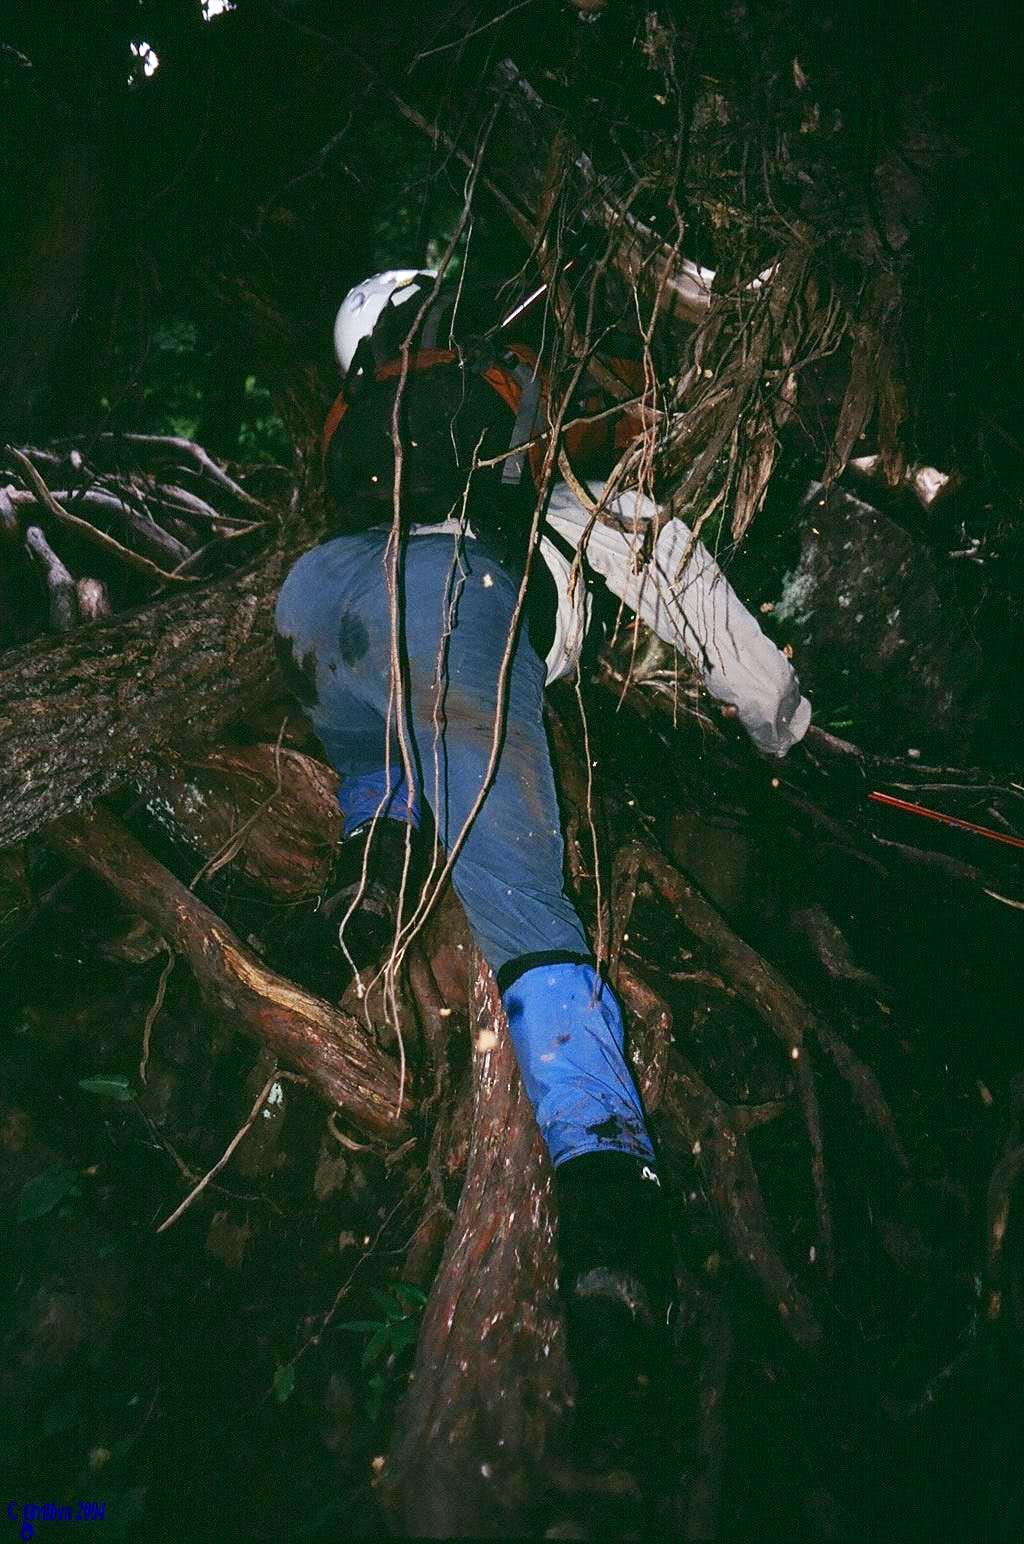 Climbing a tree chimney